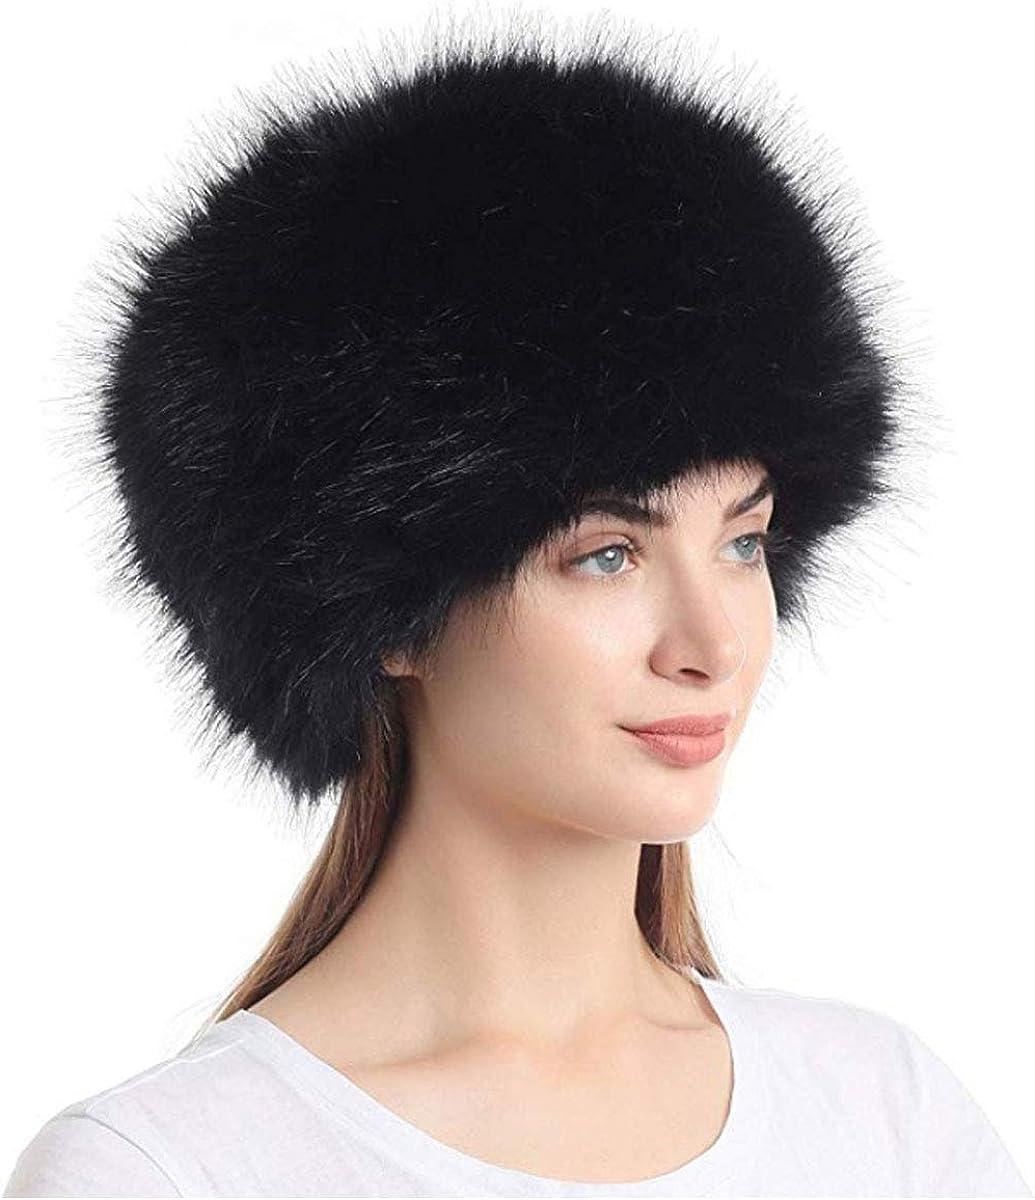 Popular brand in the world Women Max 44% OFF Faux Fur Headband Lady Weather Winter Earwar Cold